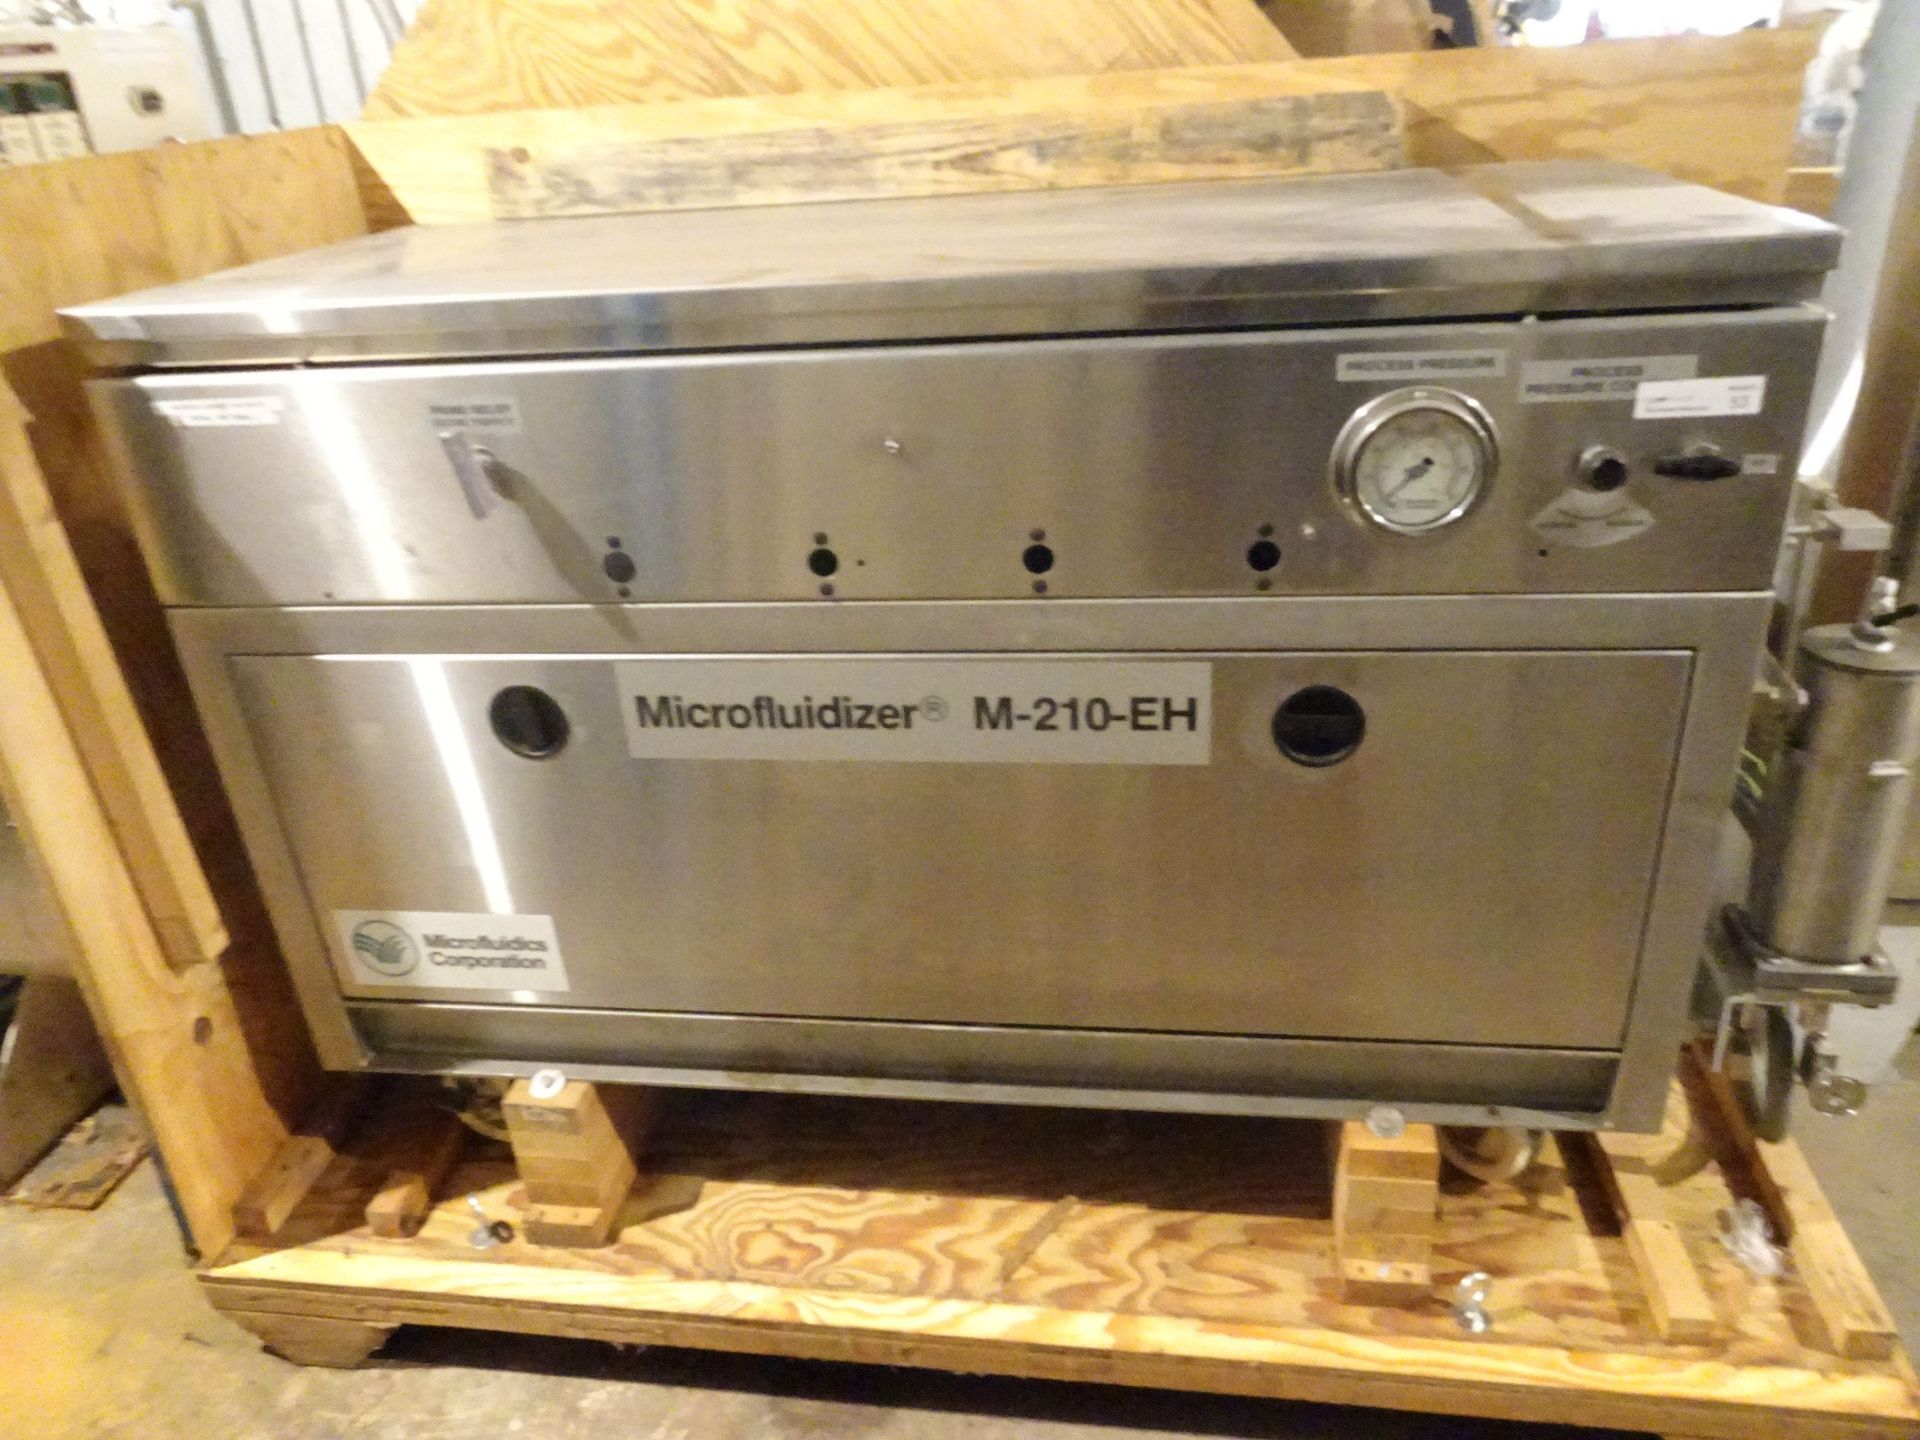 Lot 32 - Microfluidics Corp M-210-EH Shear Microfluidizer -